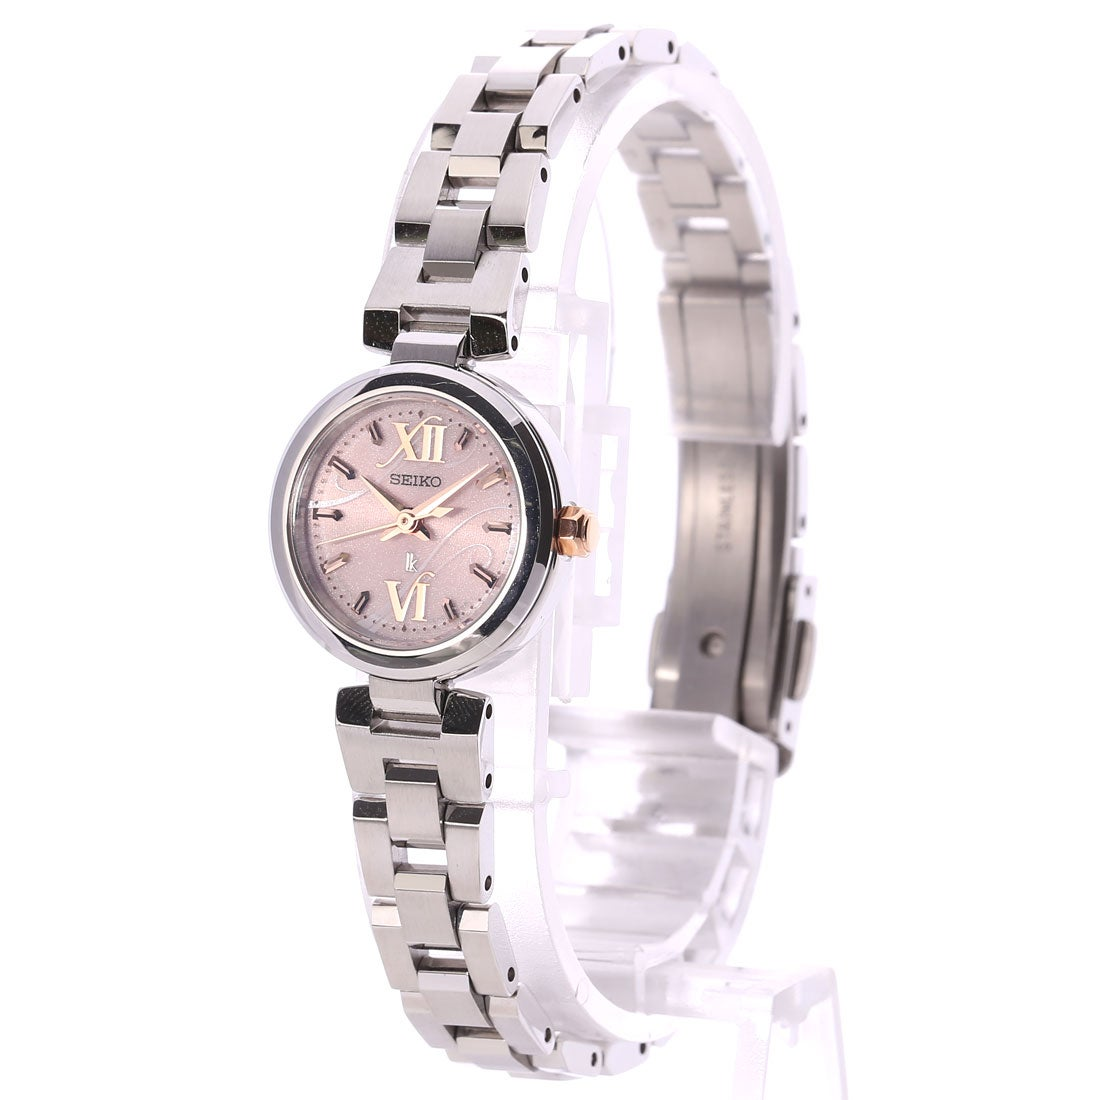 SEIKOルキアレディース腕時計